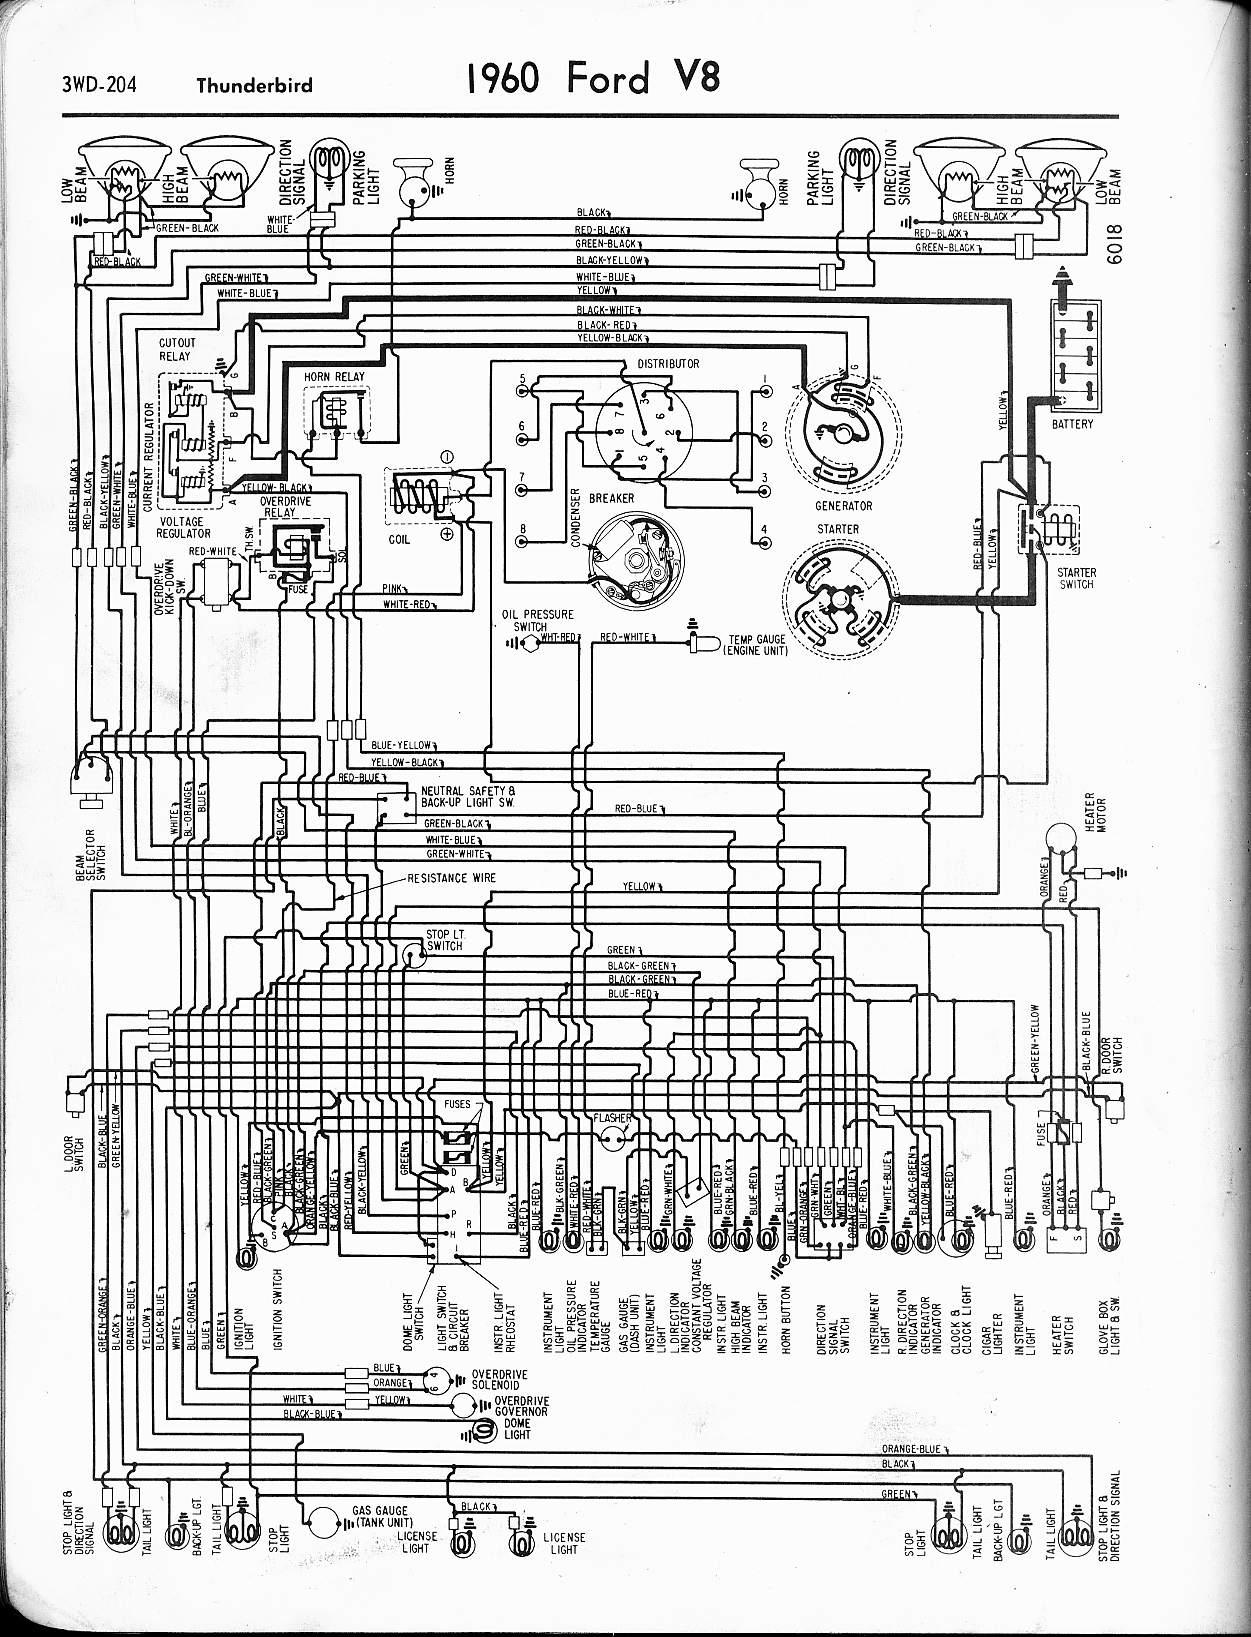 1956 ford f100 wiring diagram new wiring diagram 2018